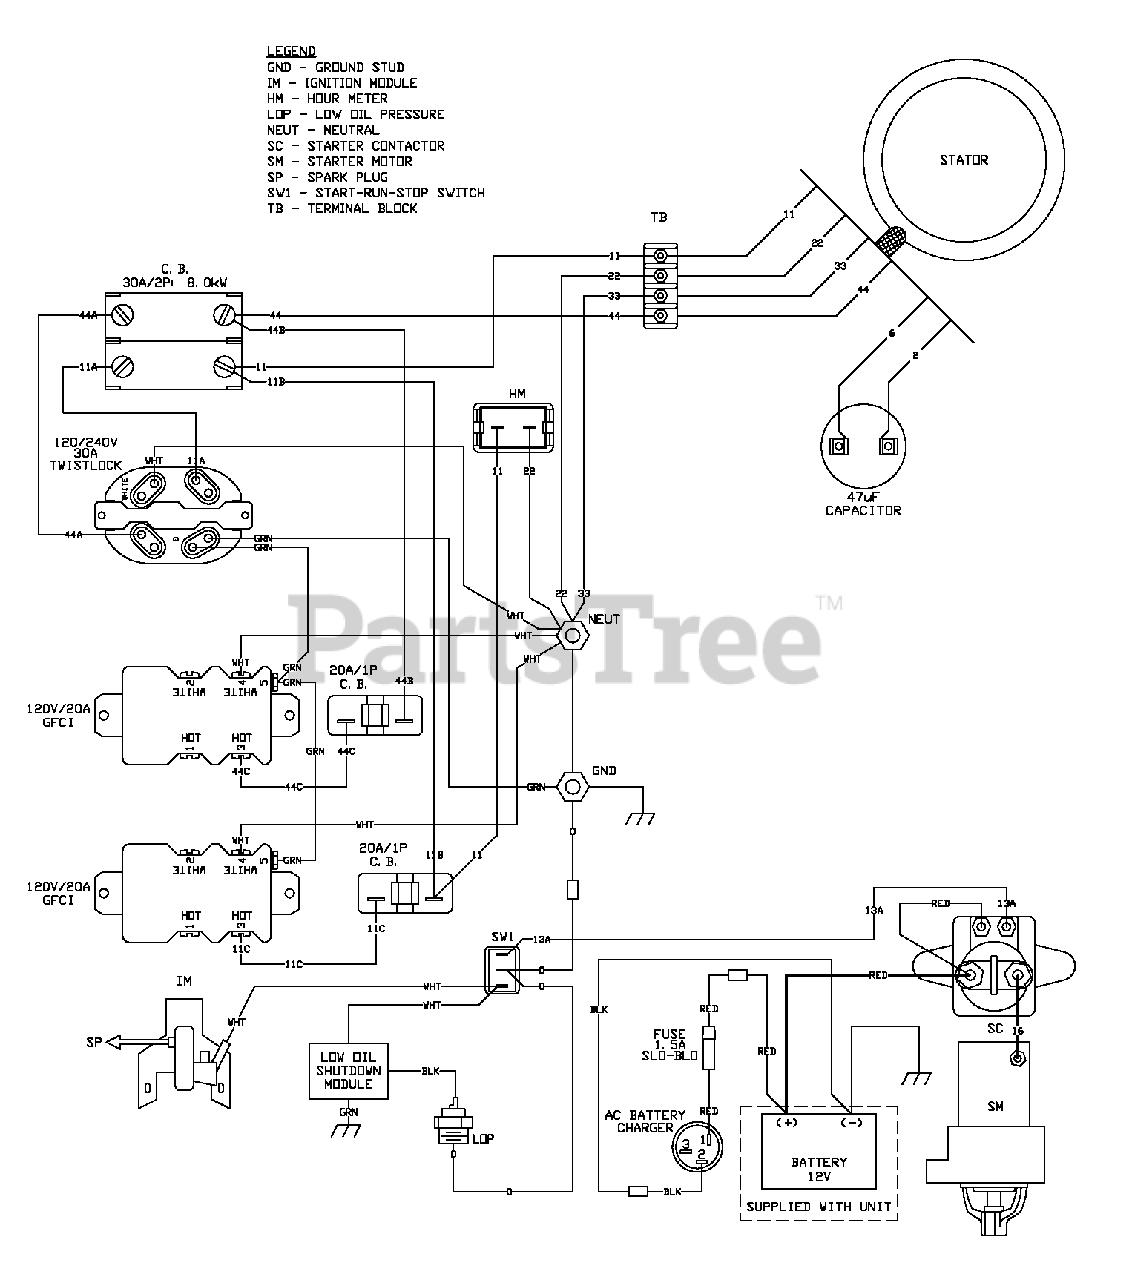 Generac XP8000 (0056061) - Generac Portable Generator (SN: 5822566 -  6264278) (2011) Wiring - Diagram (OG9561) Parts Lookup with Diagrams    PartsTree   Generac Engine Wiring Diagram      PartsTree